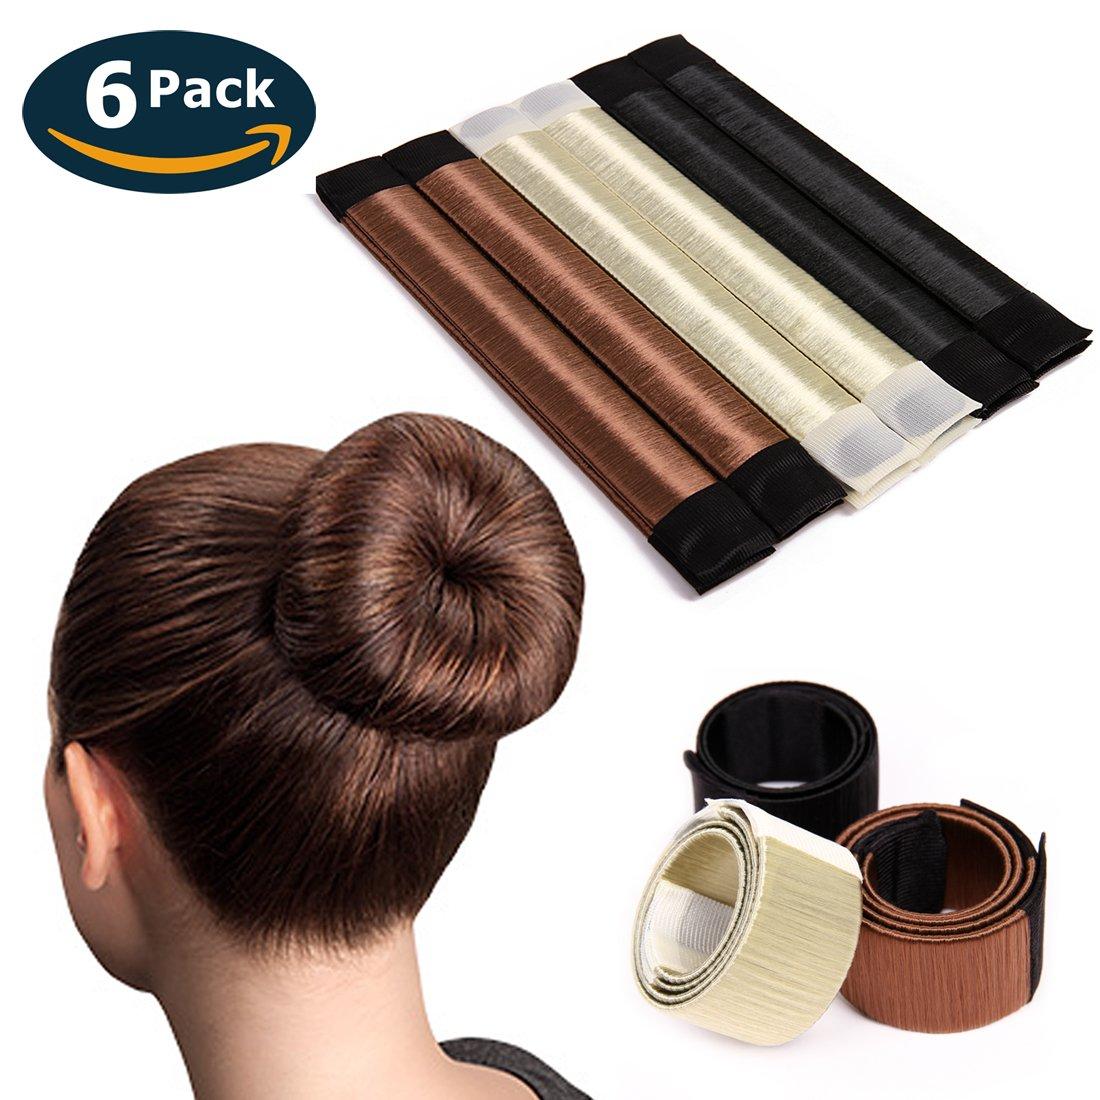 Eliace 6 PCS French Bun Tail Hair Buns Maker Magic DIY Hair Bun Making Styling French Twist Donut Bun Hairstyle Tool For Women Girls 3 Color